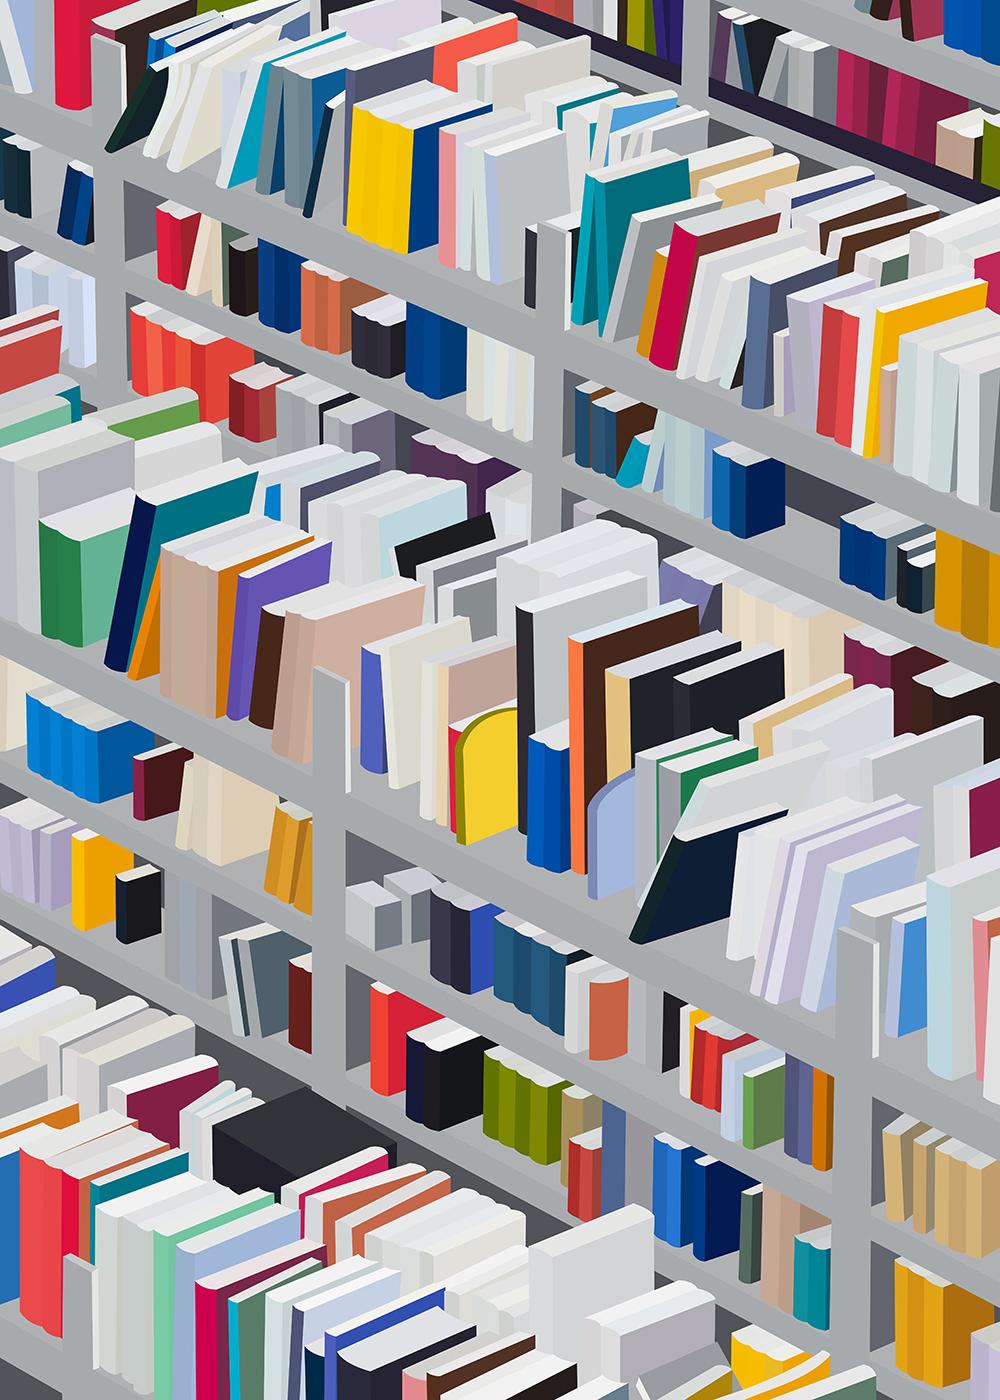 Amazon Books by Daniel Rich